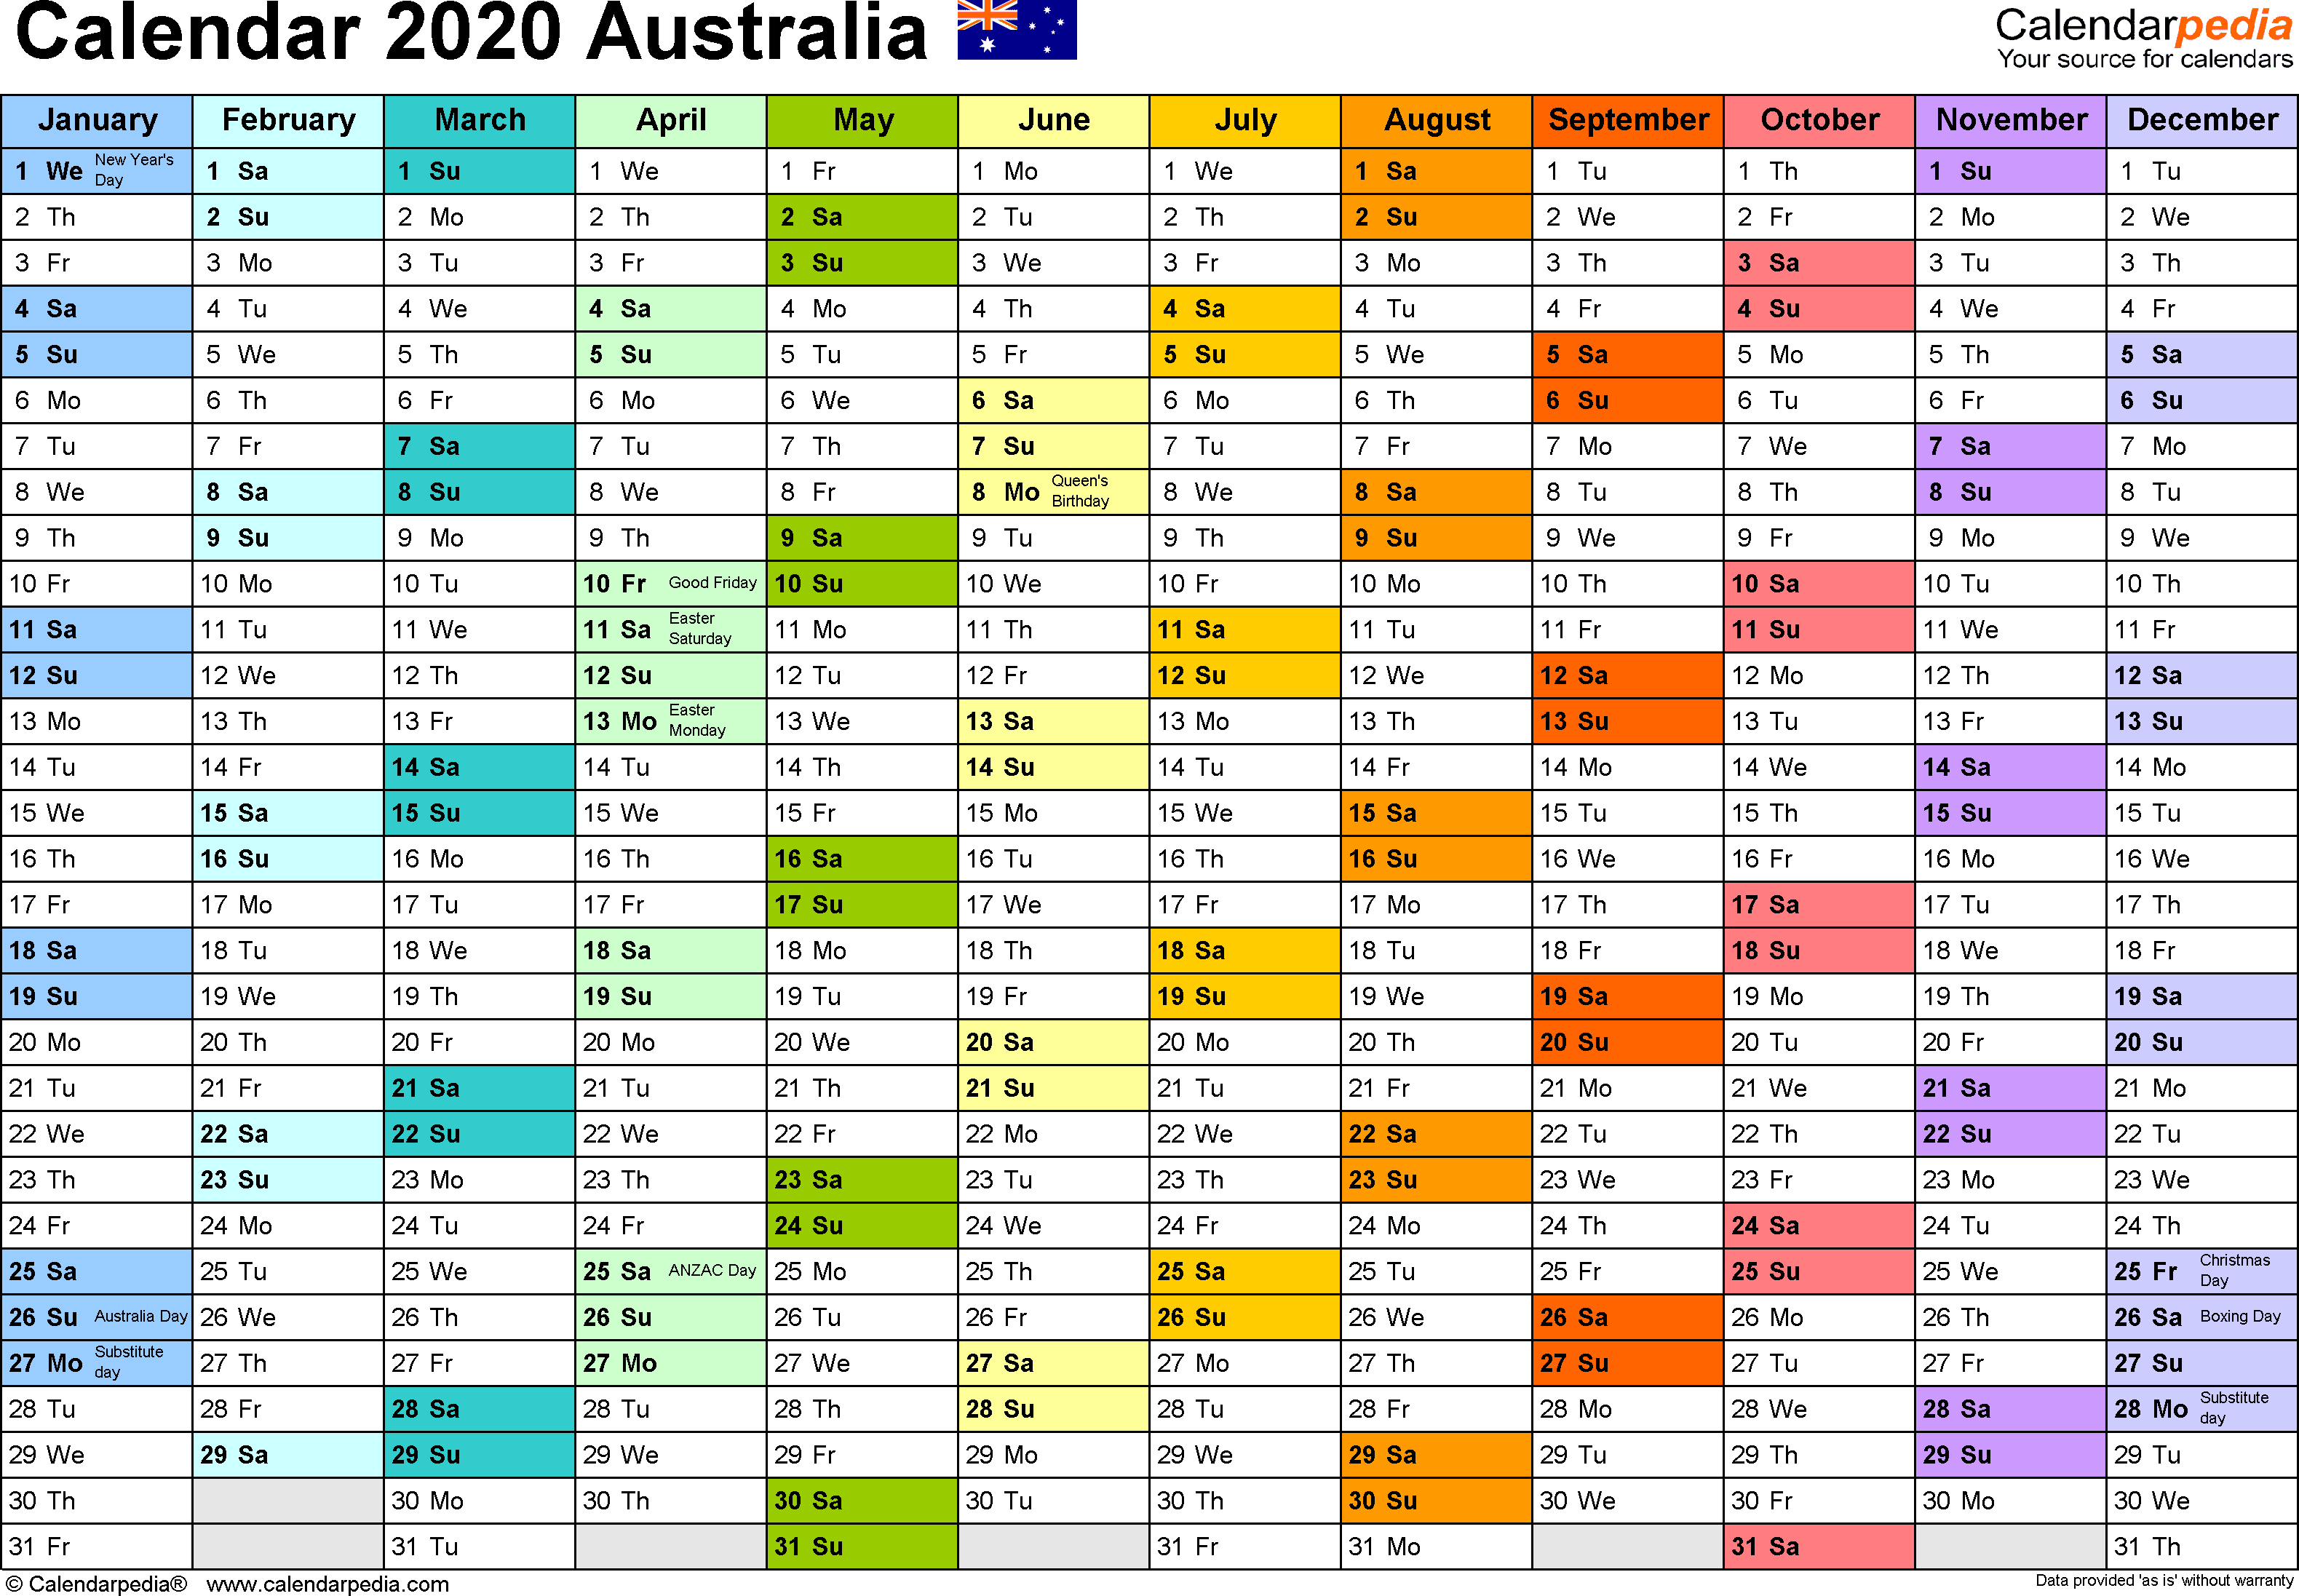 Australia Calendar 2020  Free Printable Pdf Templates throughout Calendar 2020 Qld